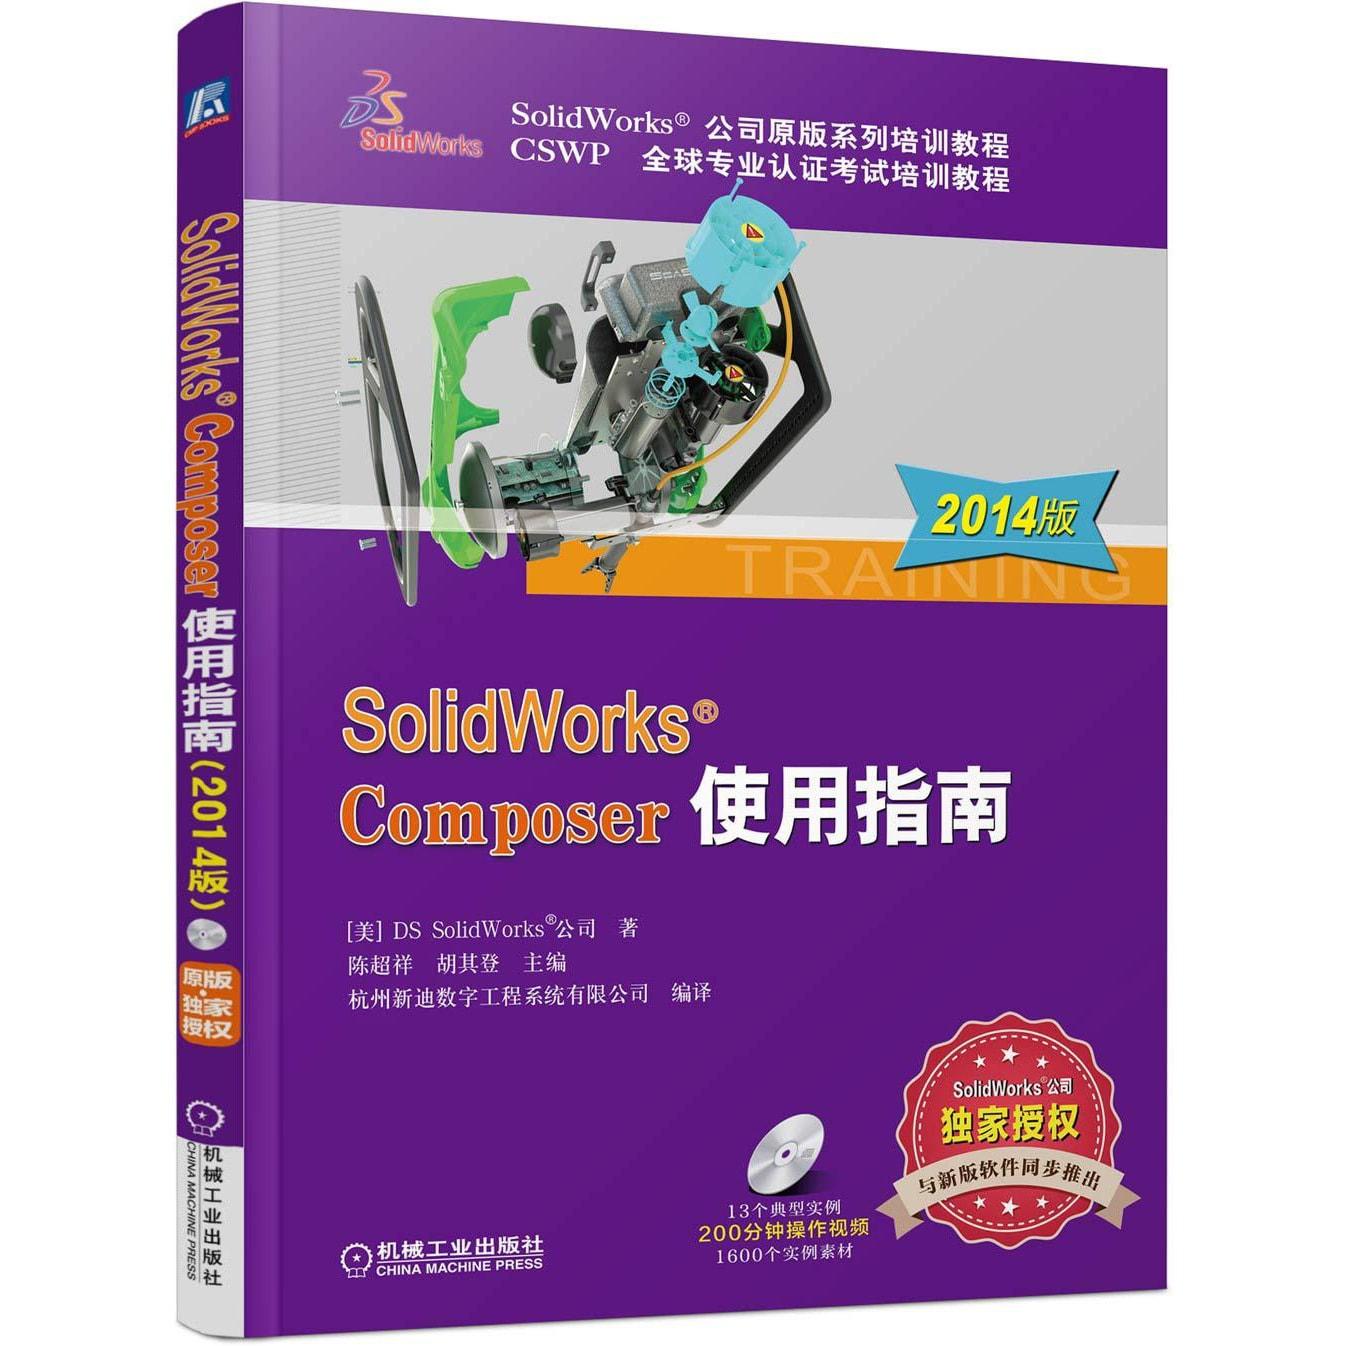 SolidWorks Composer使用指南(2014版) 怎么样 - 亚米网